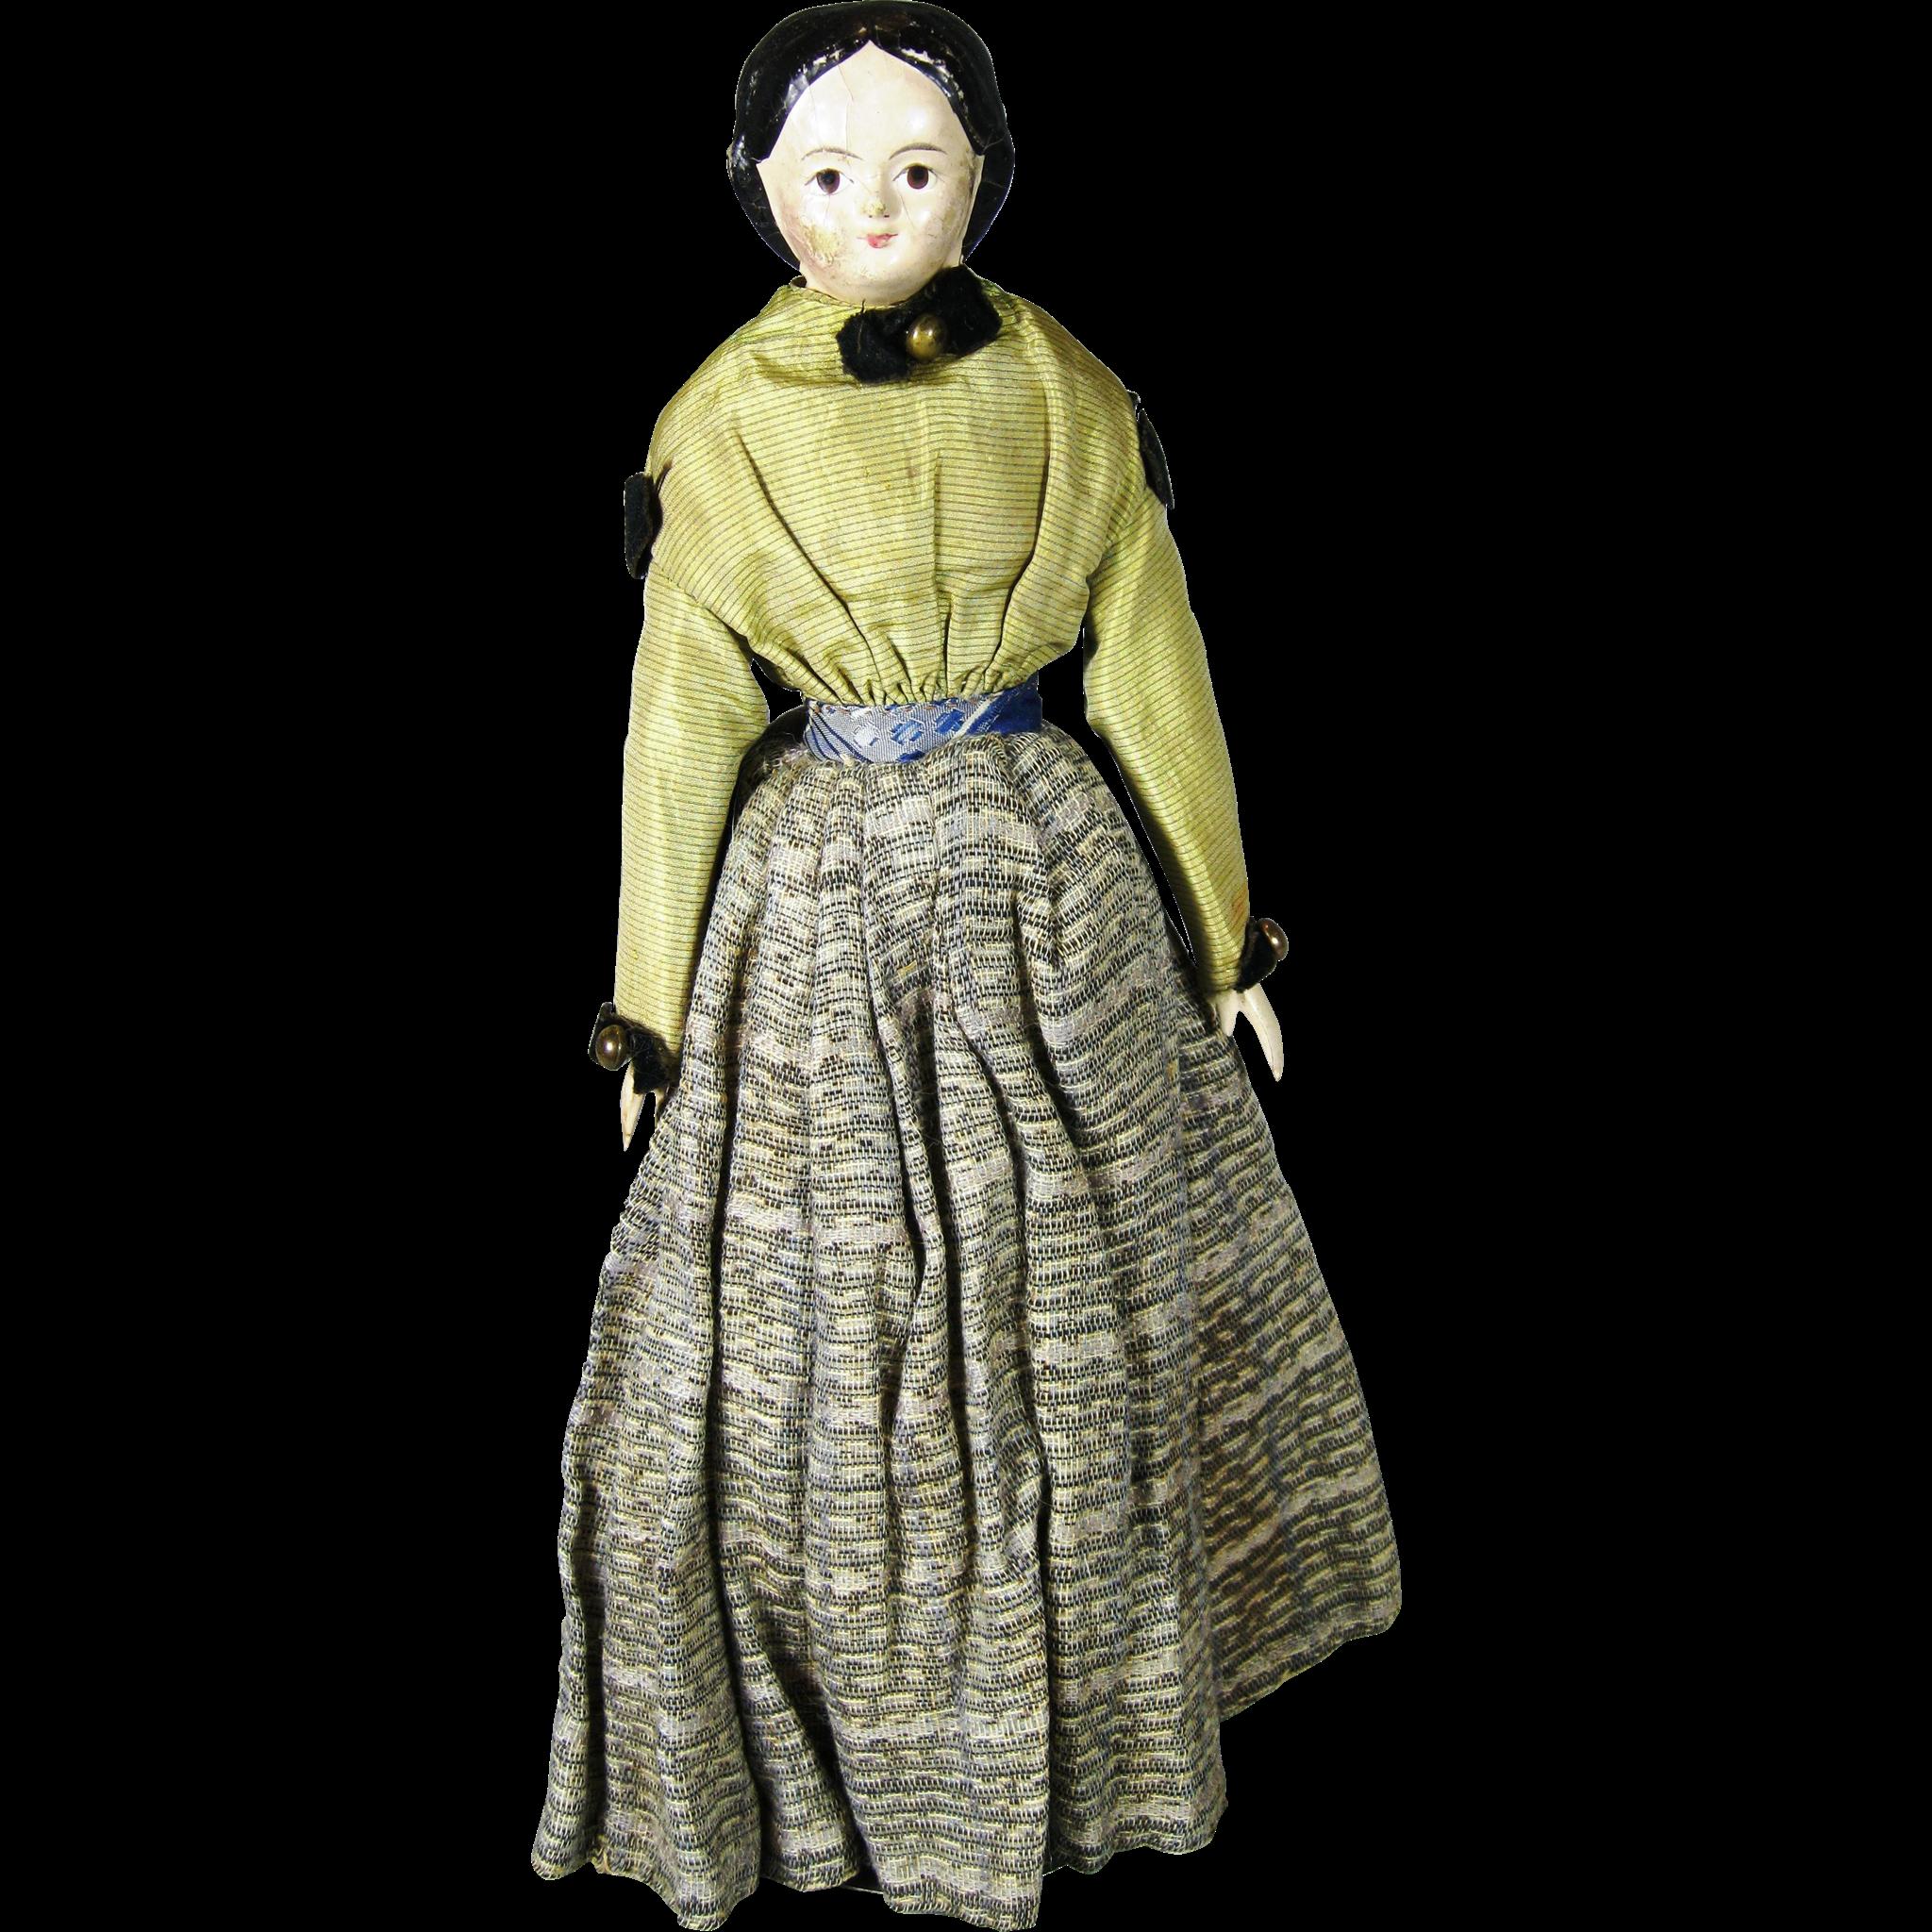 a o antique 11 german papier mache milliner 39 s model doll from victoriasdollhouse on ruby lane. Black Bedroom Furniture Sets. Home Design Ideas